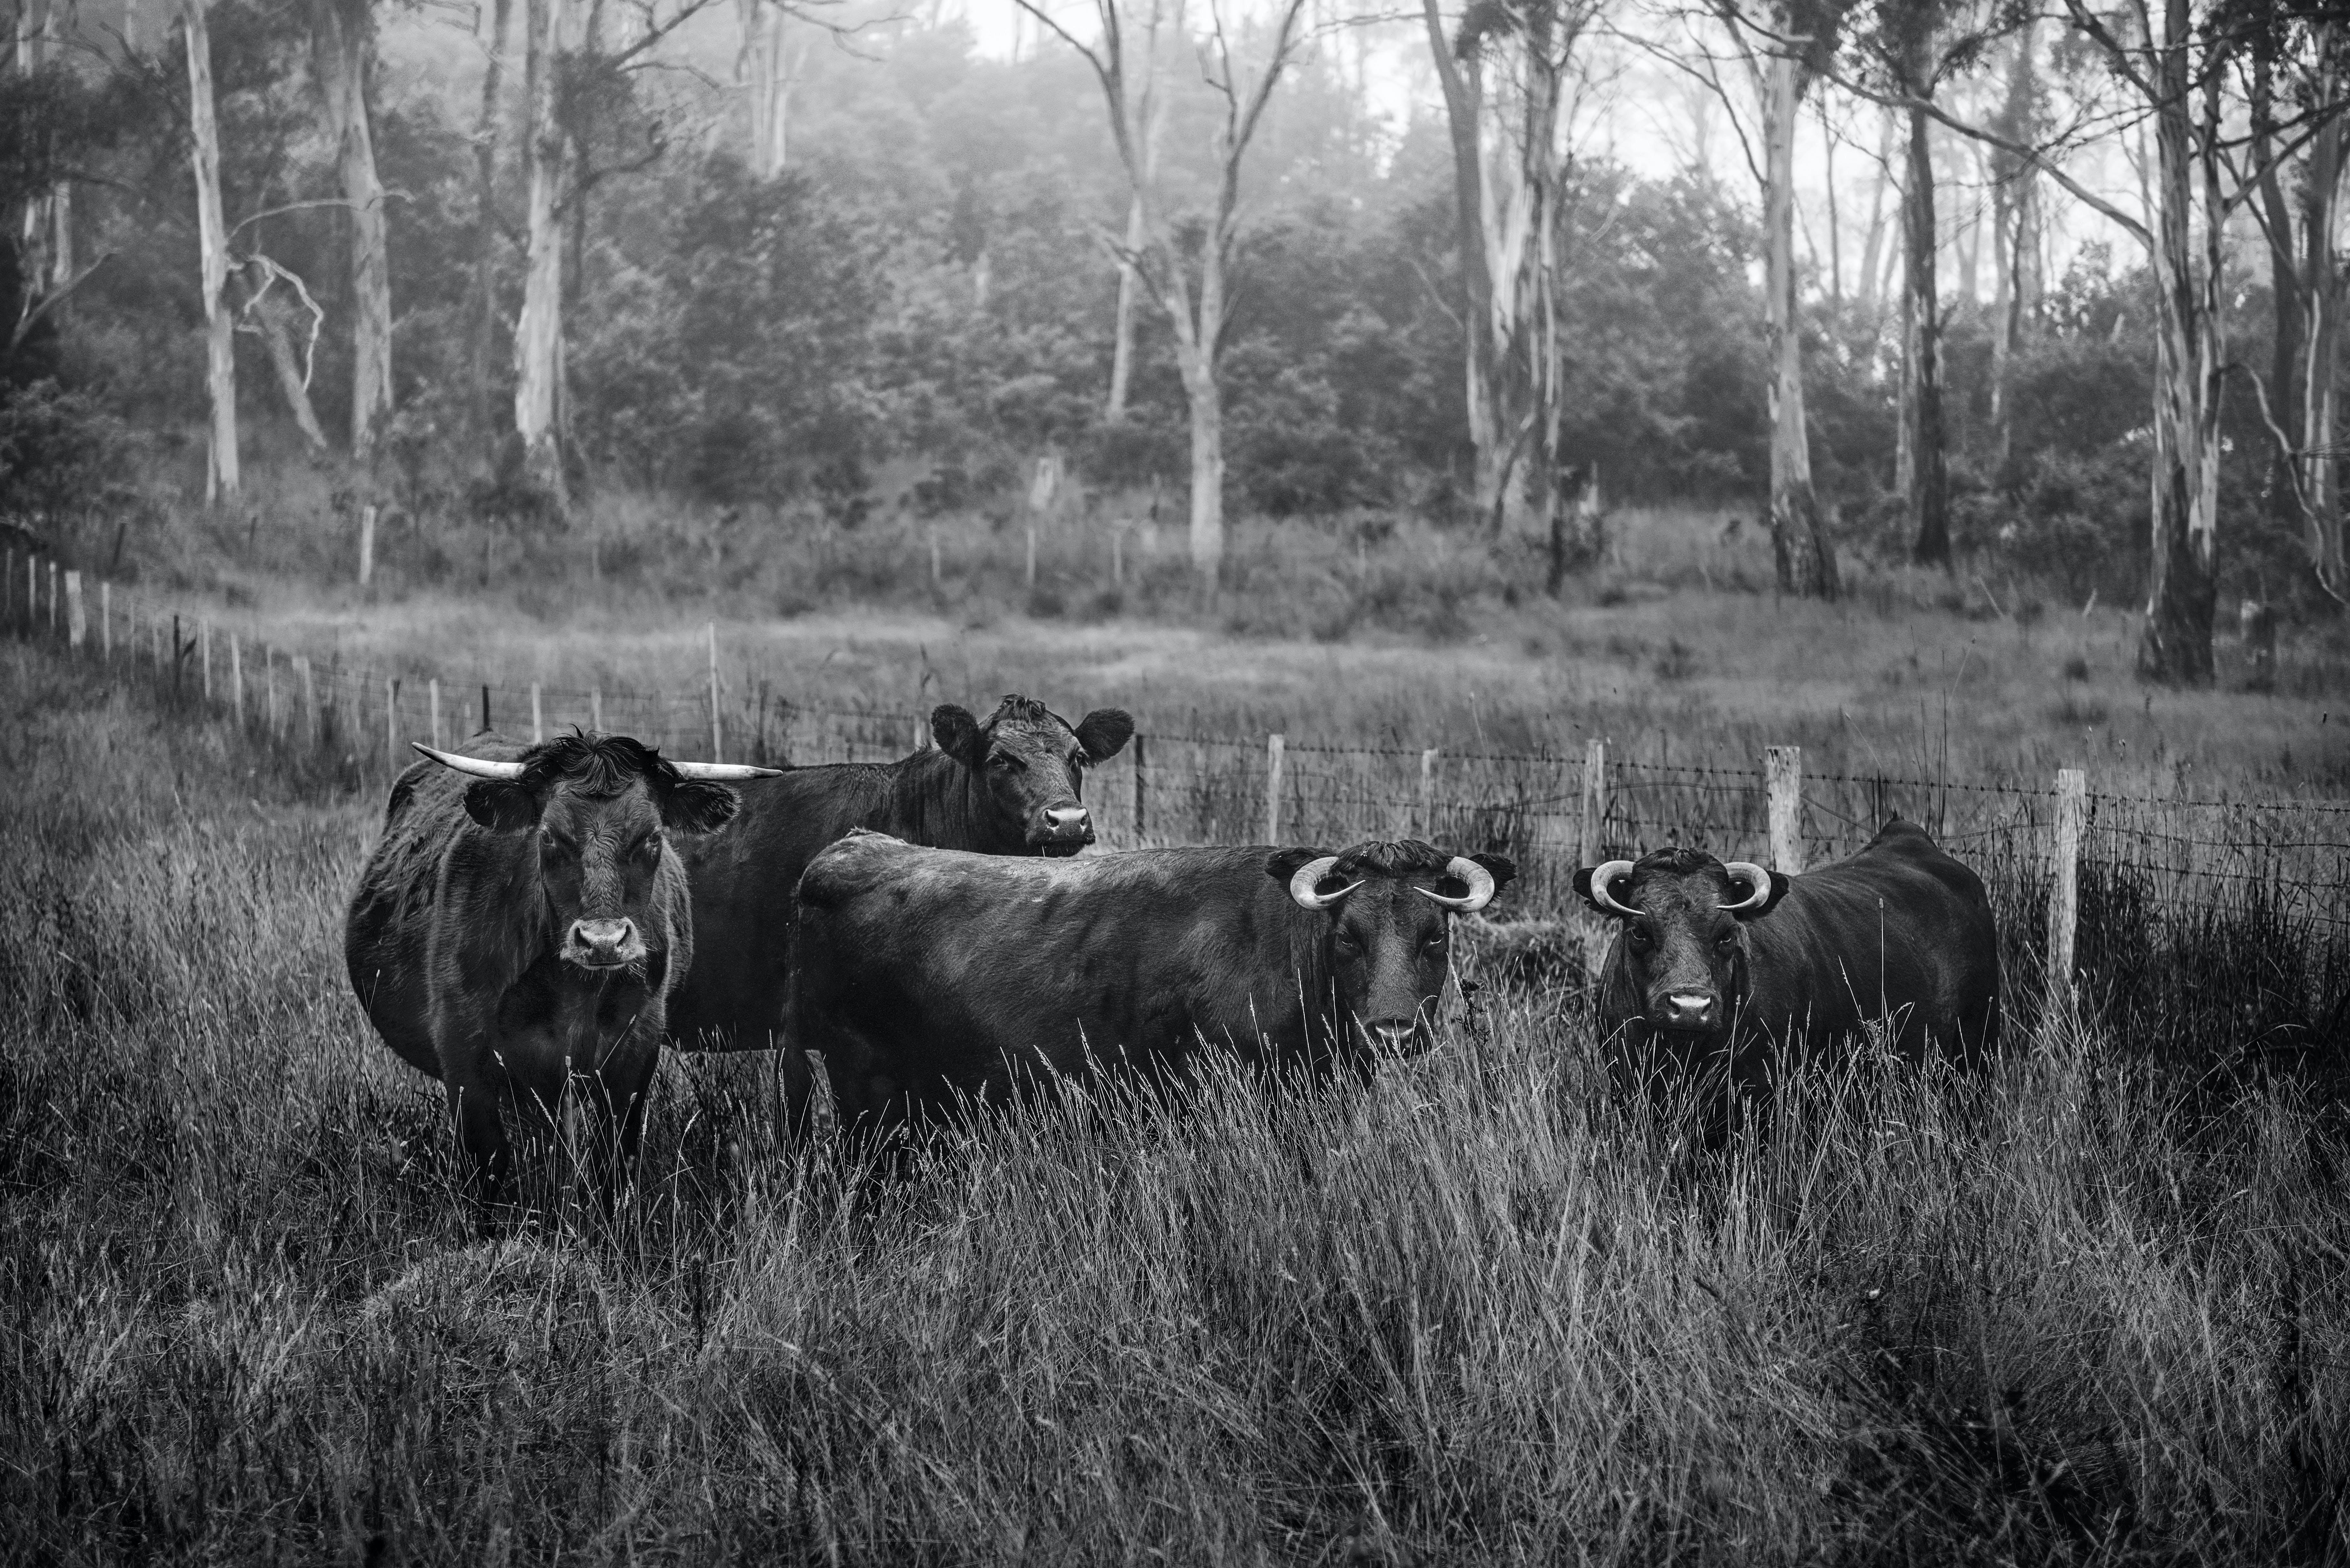 Cows on Grass Field Near Trees